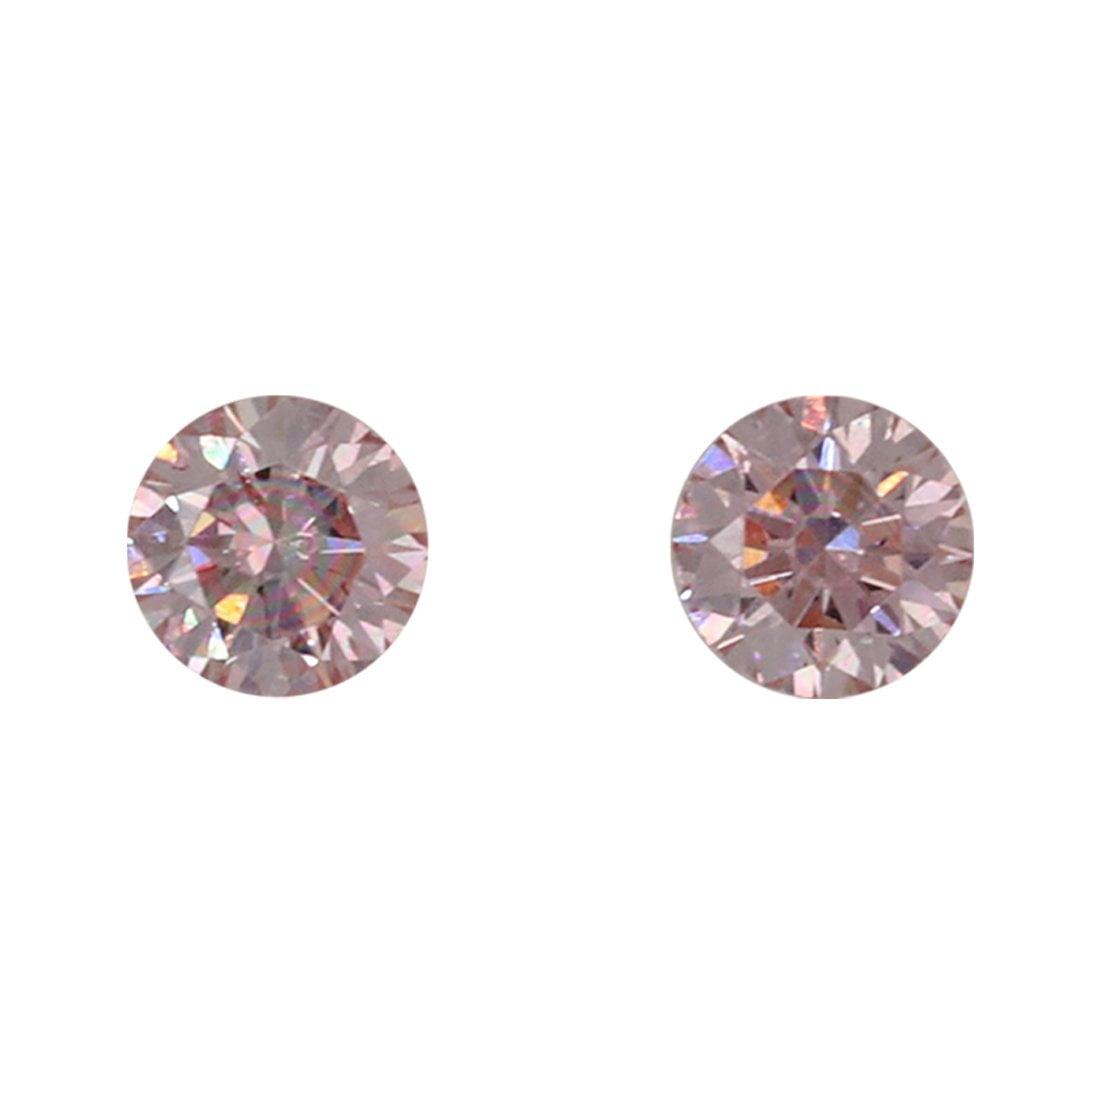 2=0.15ct Natural Fancy Pink, 6P Argyle Diamond